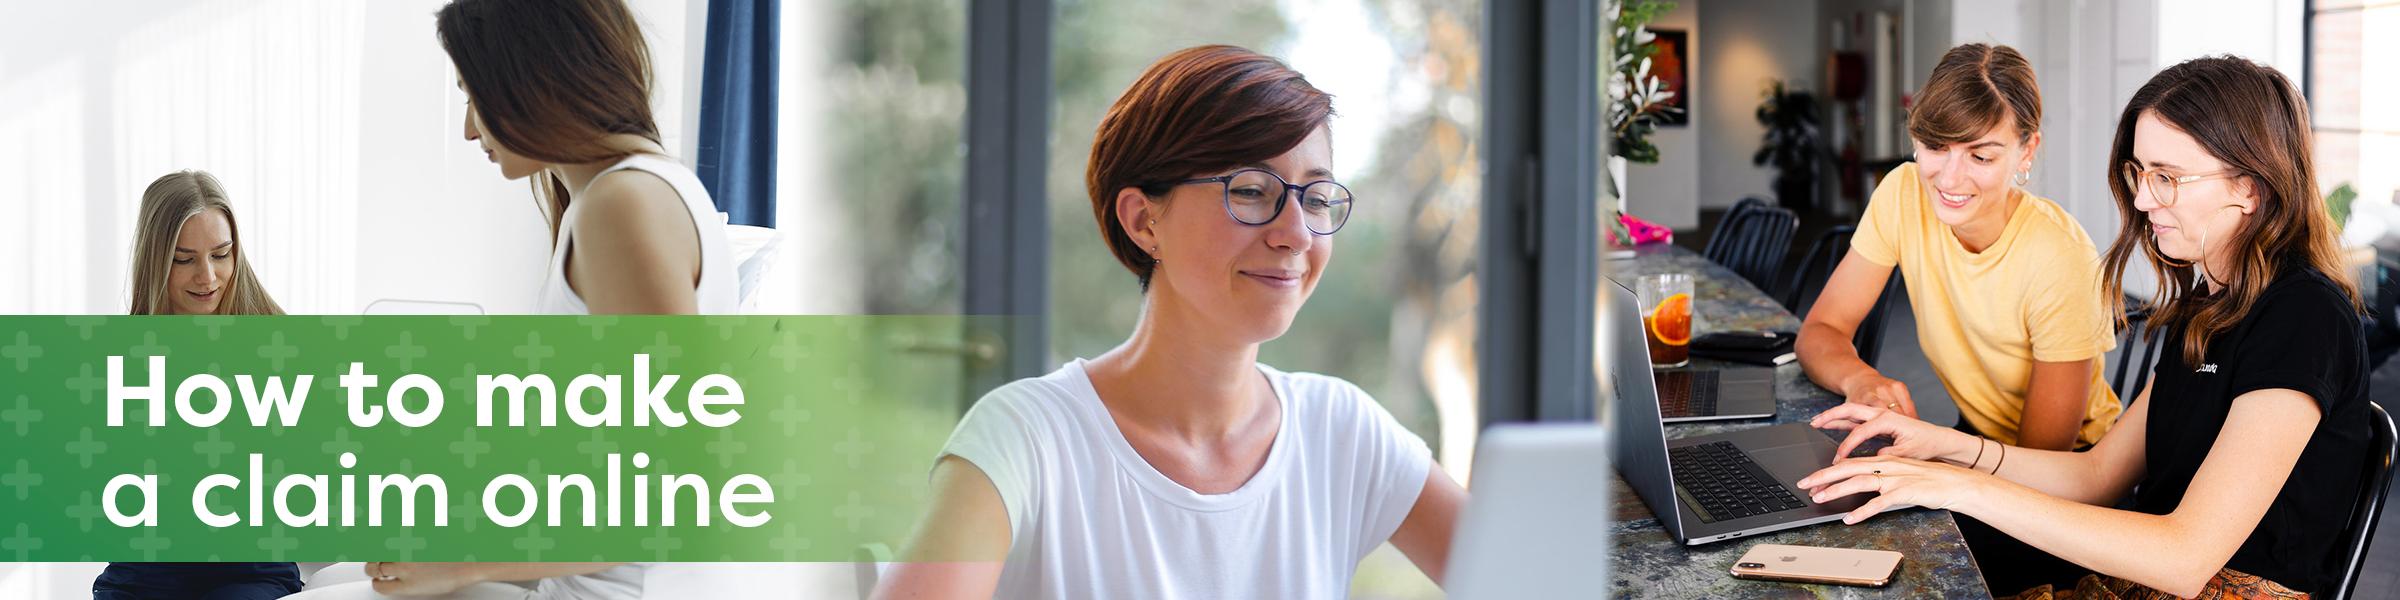 how to make a claim online-HealthCarePlus-1